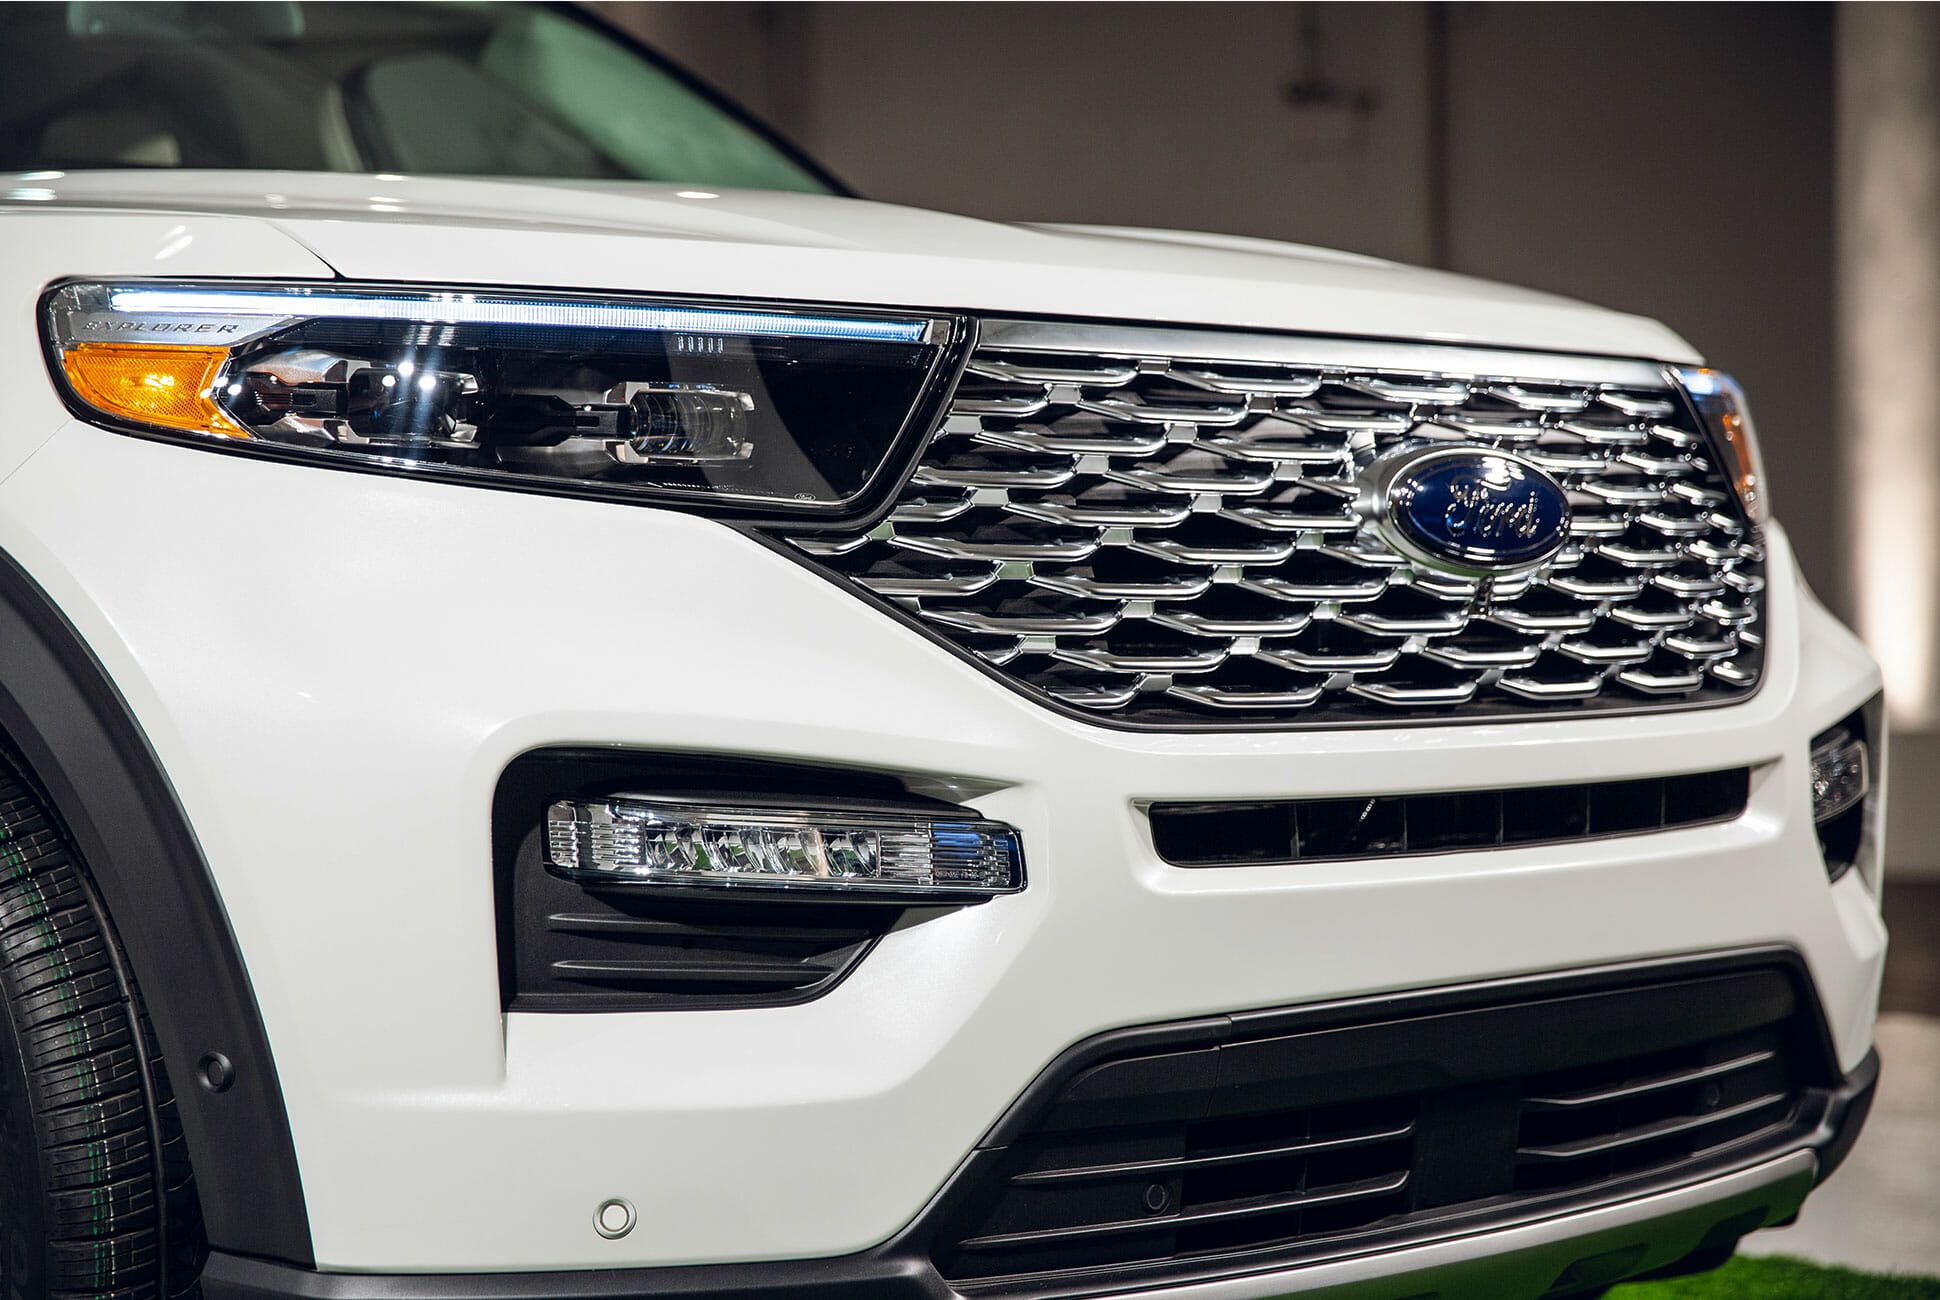 2020-Ford-Explorer-gear-patrol-slide-6